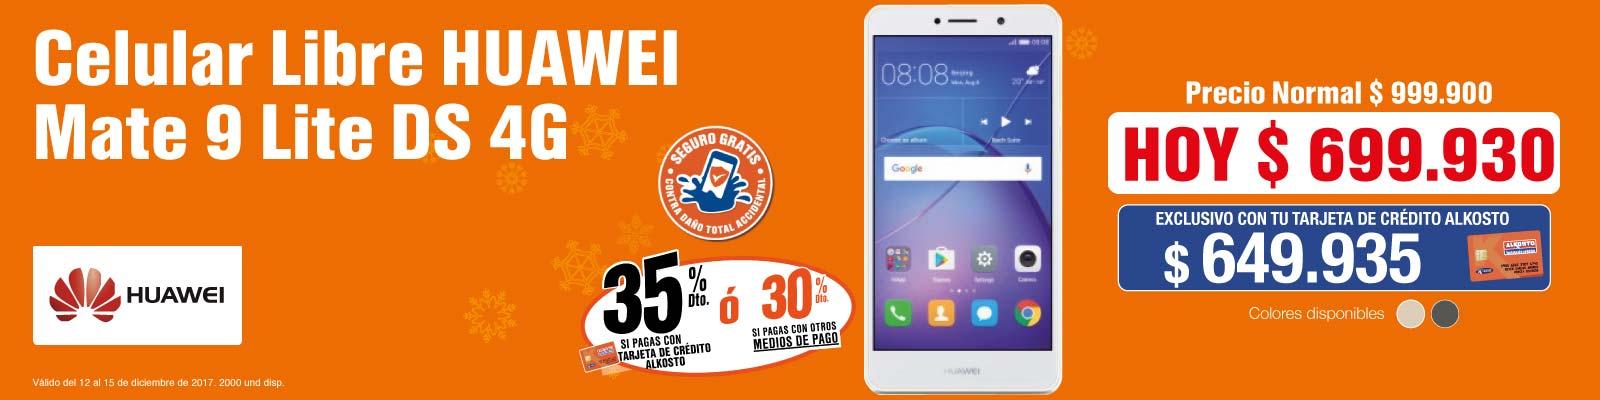 BOTON TOP PROMO AK-1-celulares-HUAWEIMate9-cat-diciembre-12-15